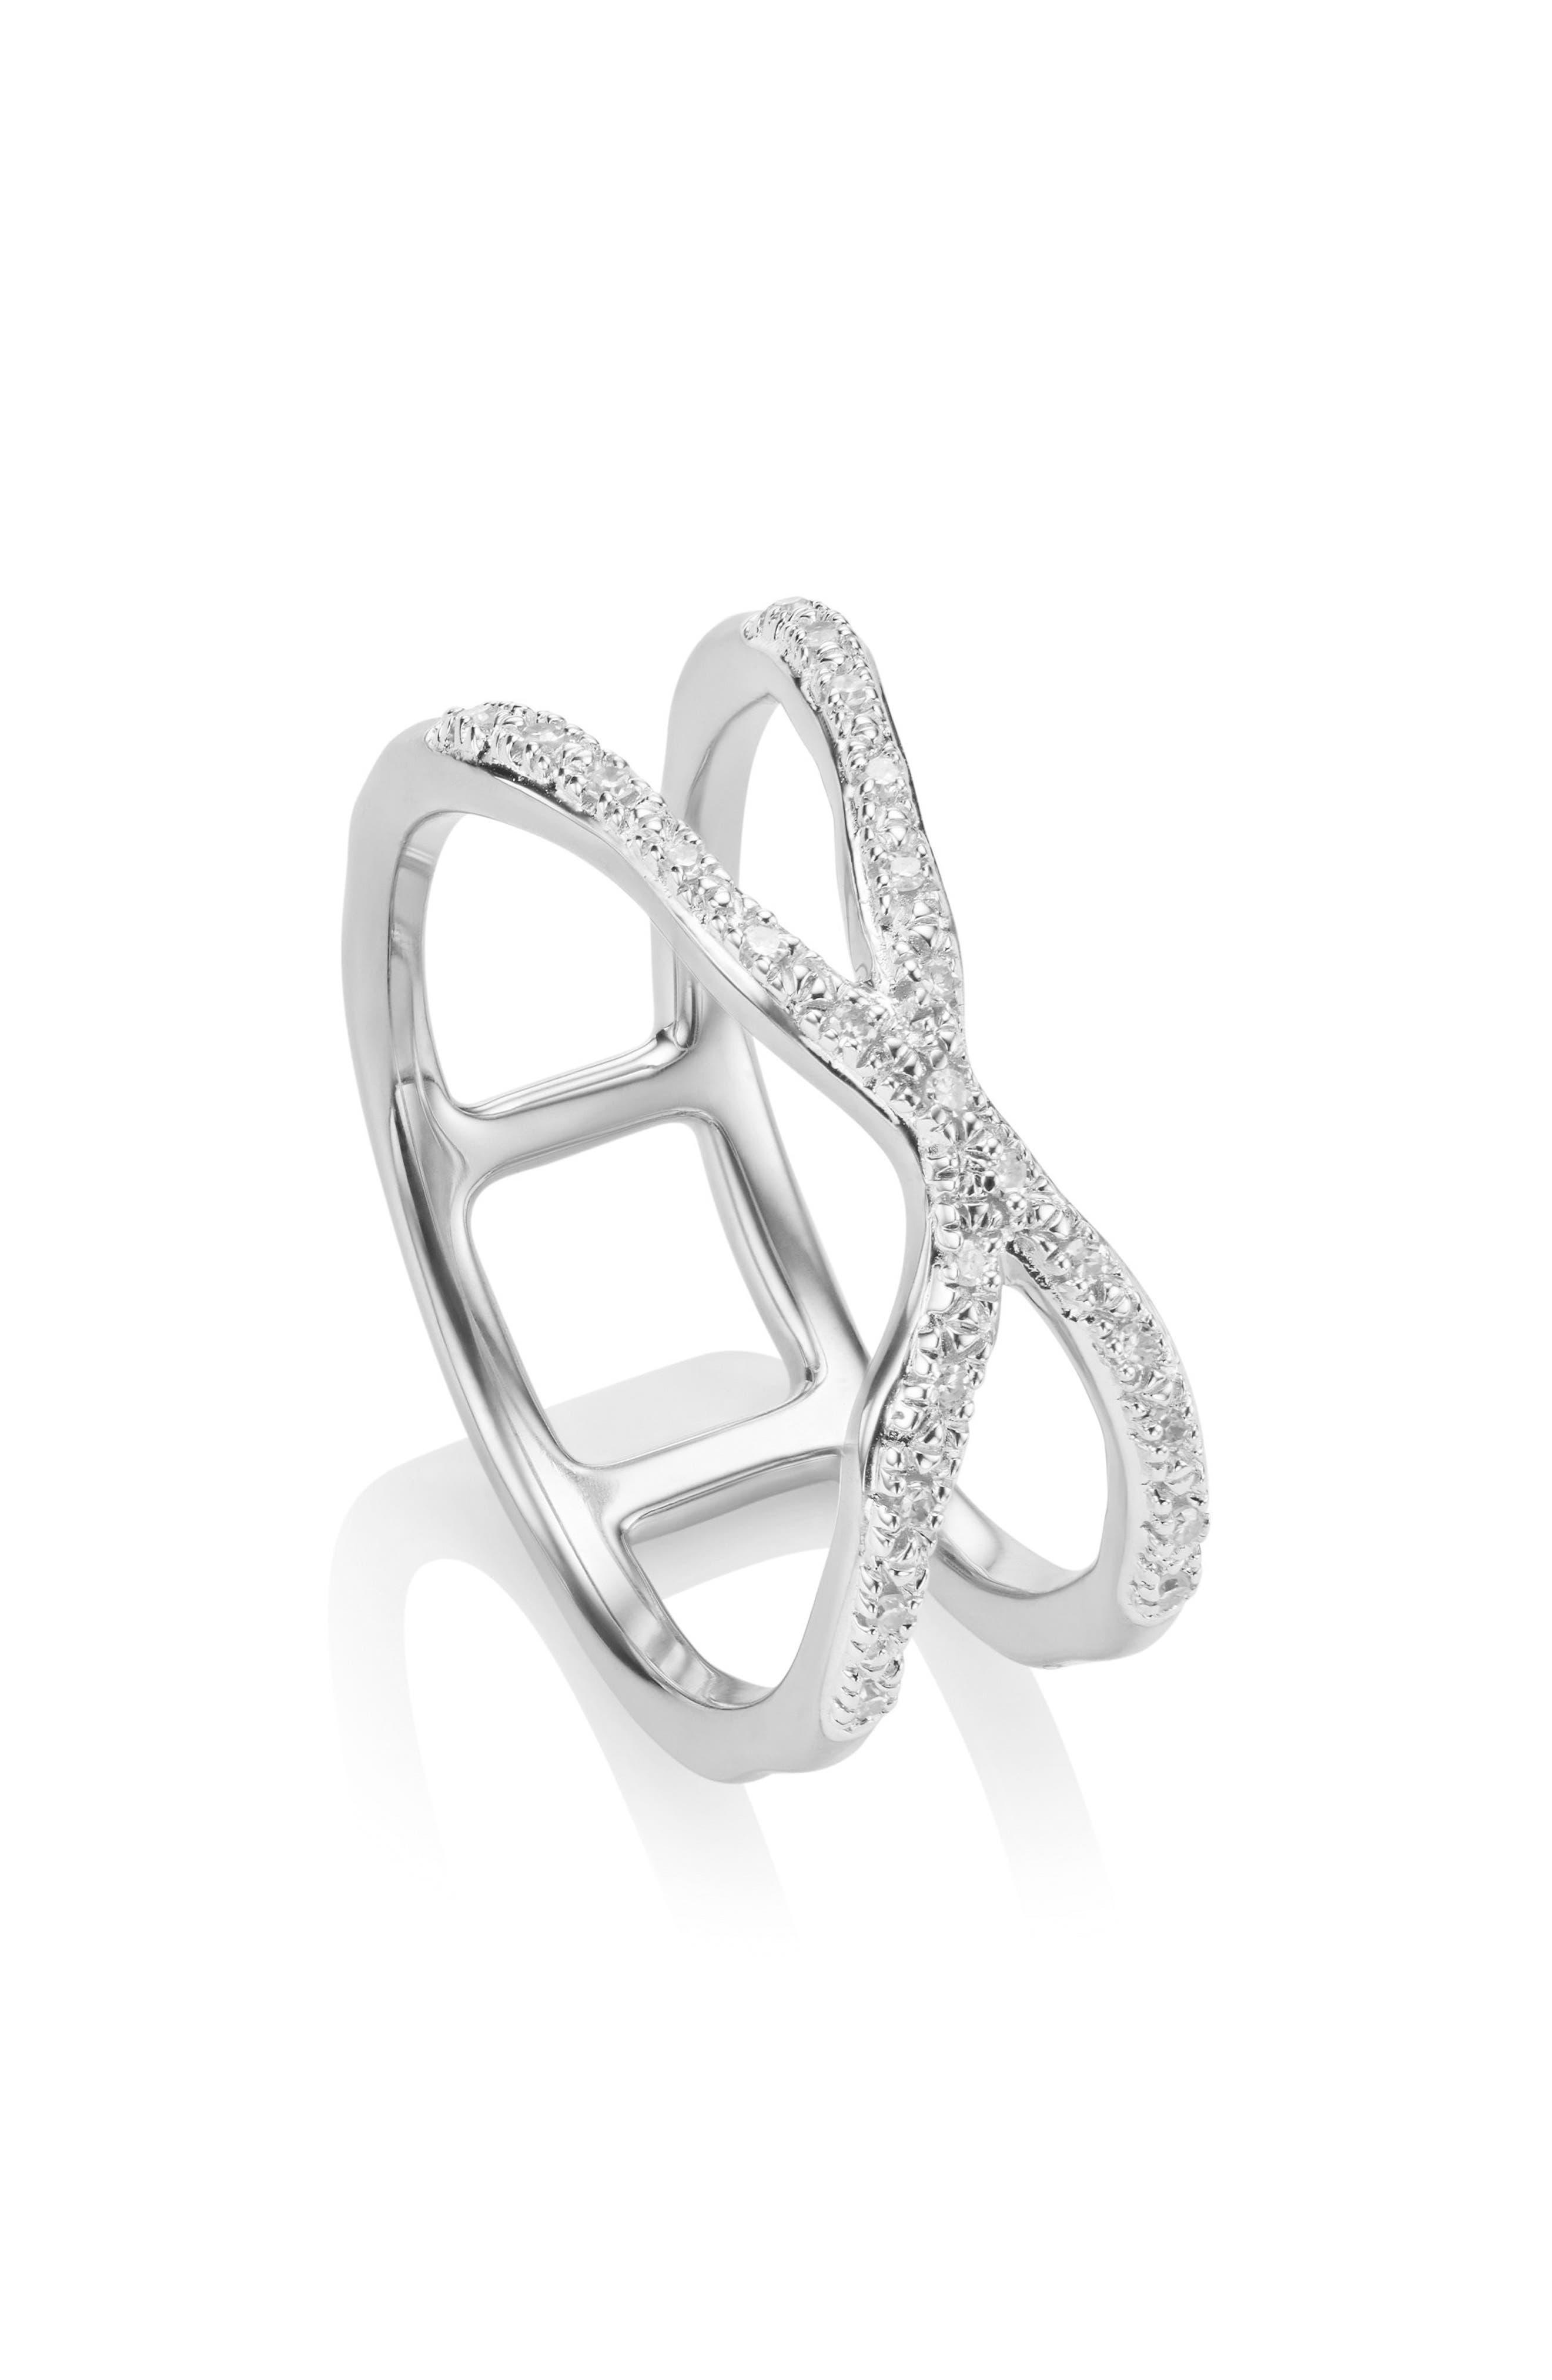 Riva Diamond Ring,                             Alternate thumbnail 3, color,                             Silver/ Diamond